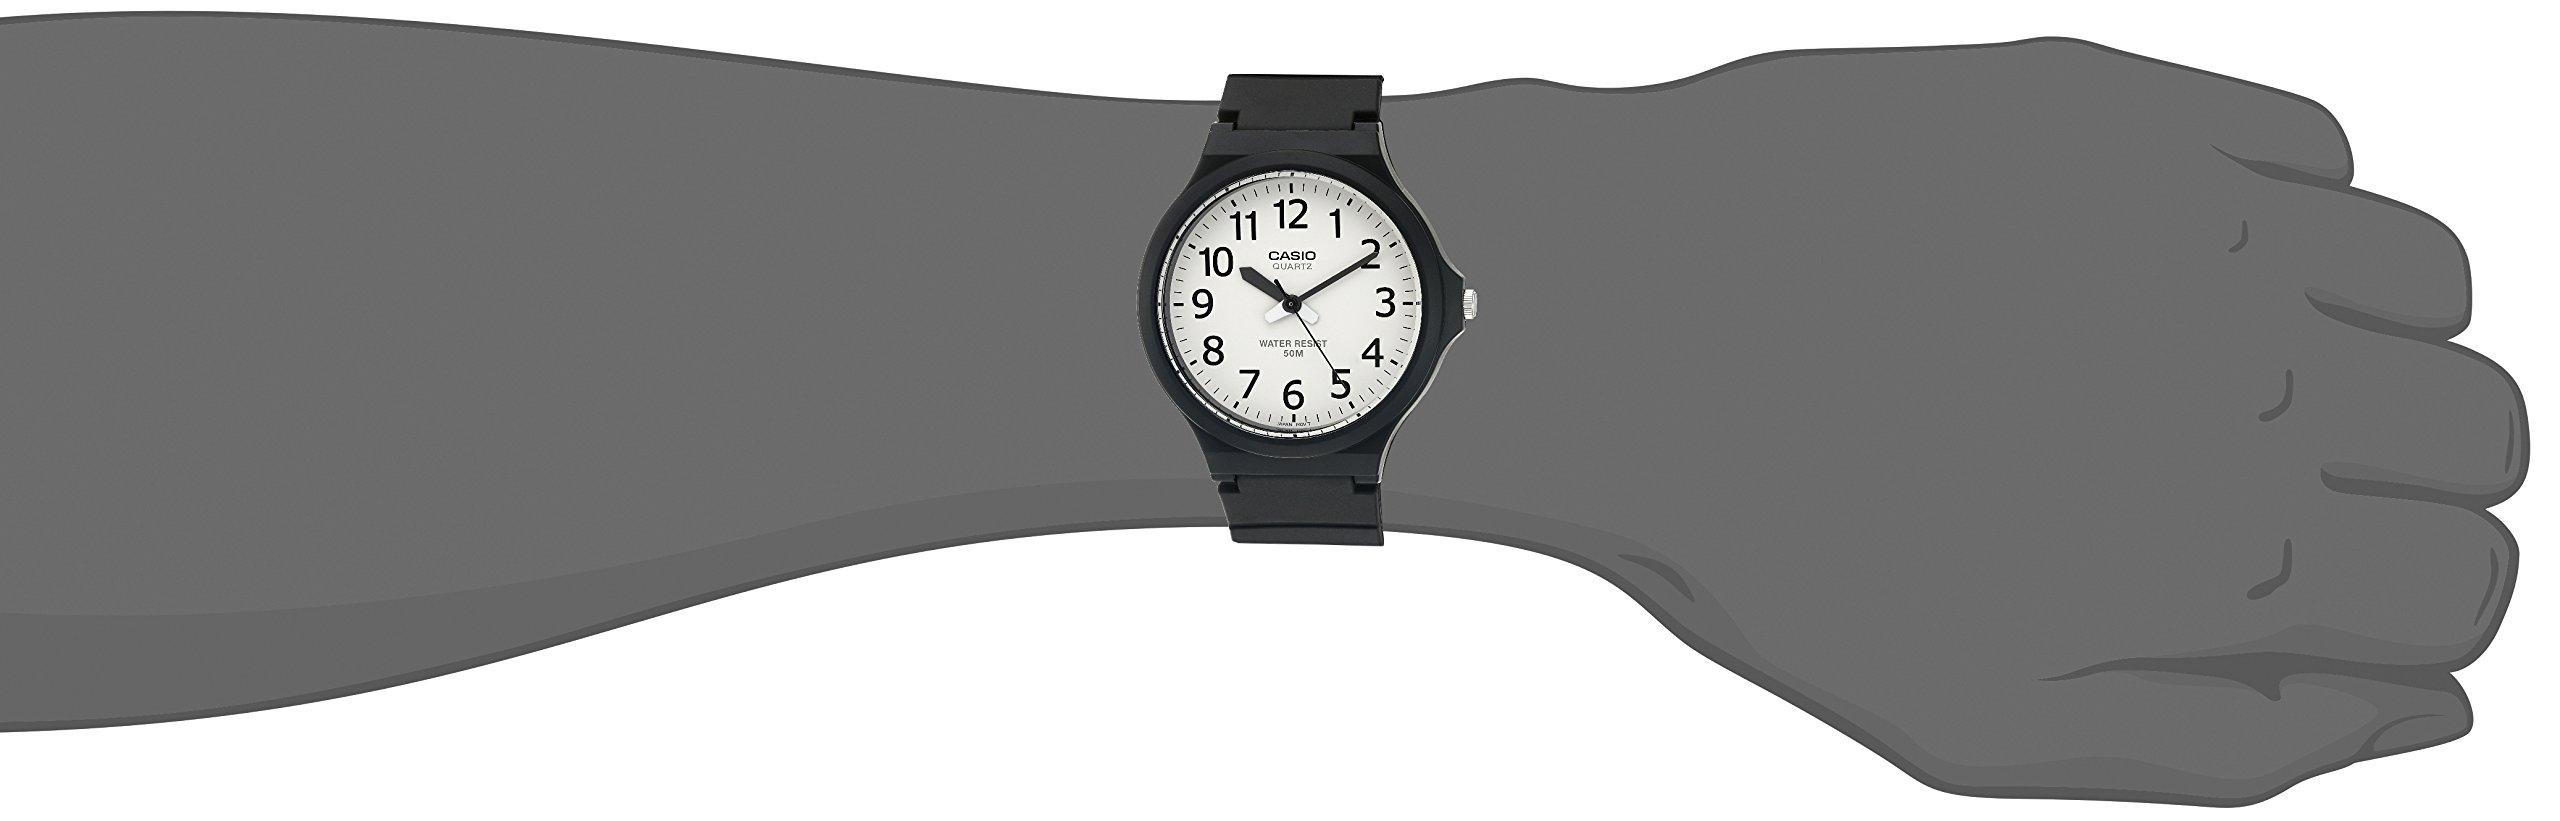 Casio Men's 'Easy To Read' Quartz Black Casual Watch (Model: MW240-7BV) by Casio (Image #2)